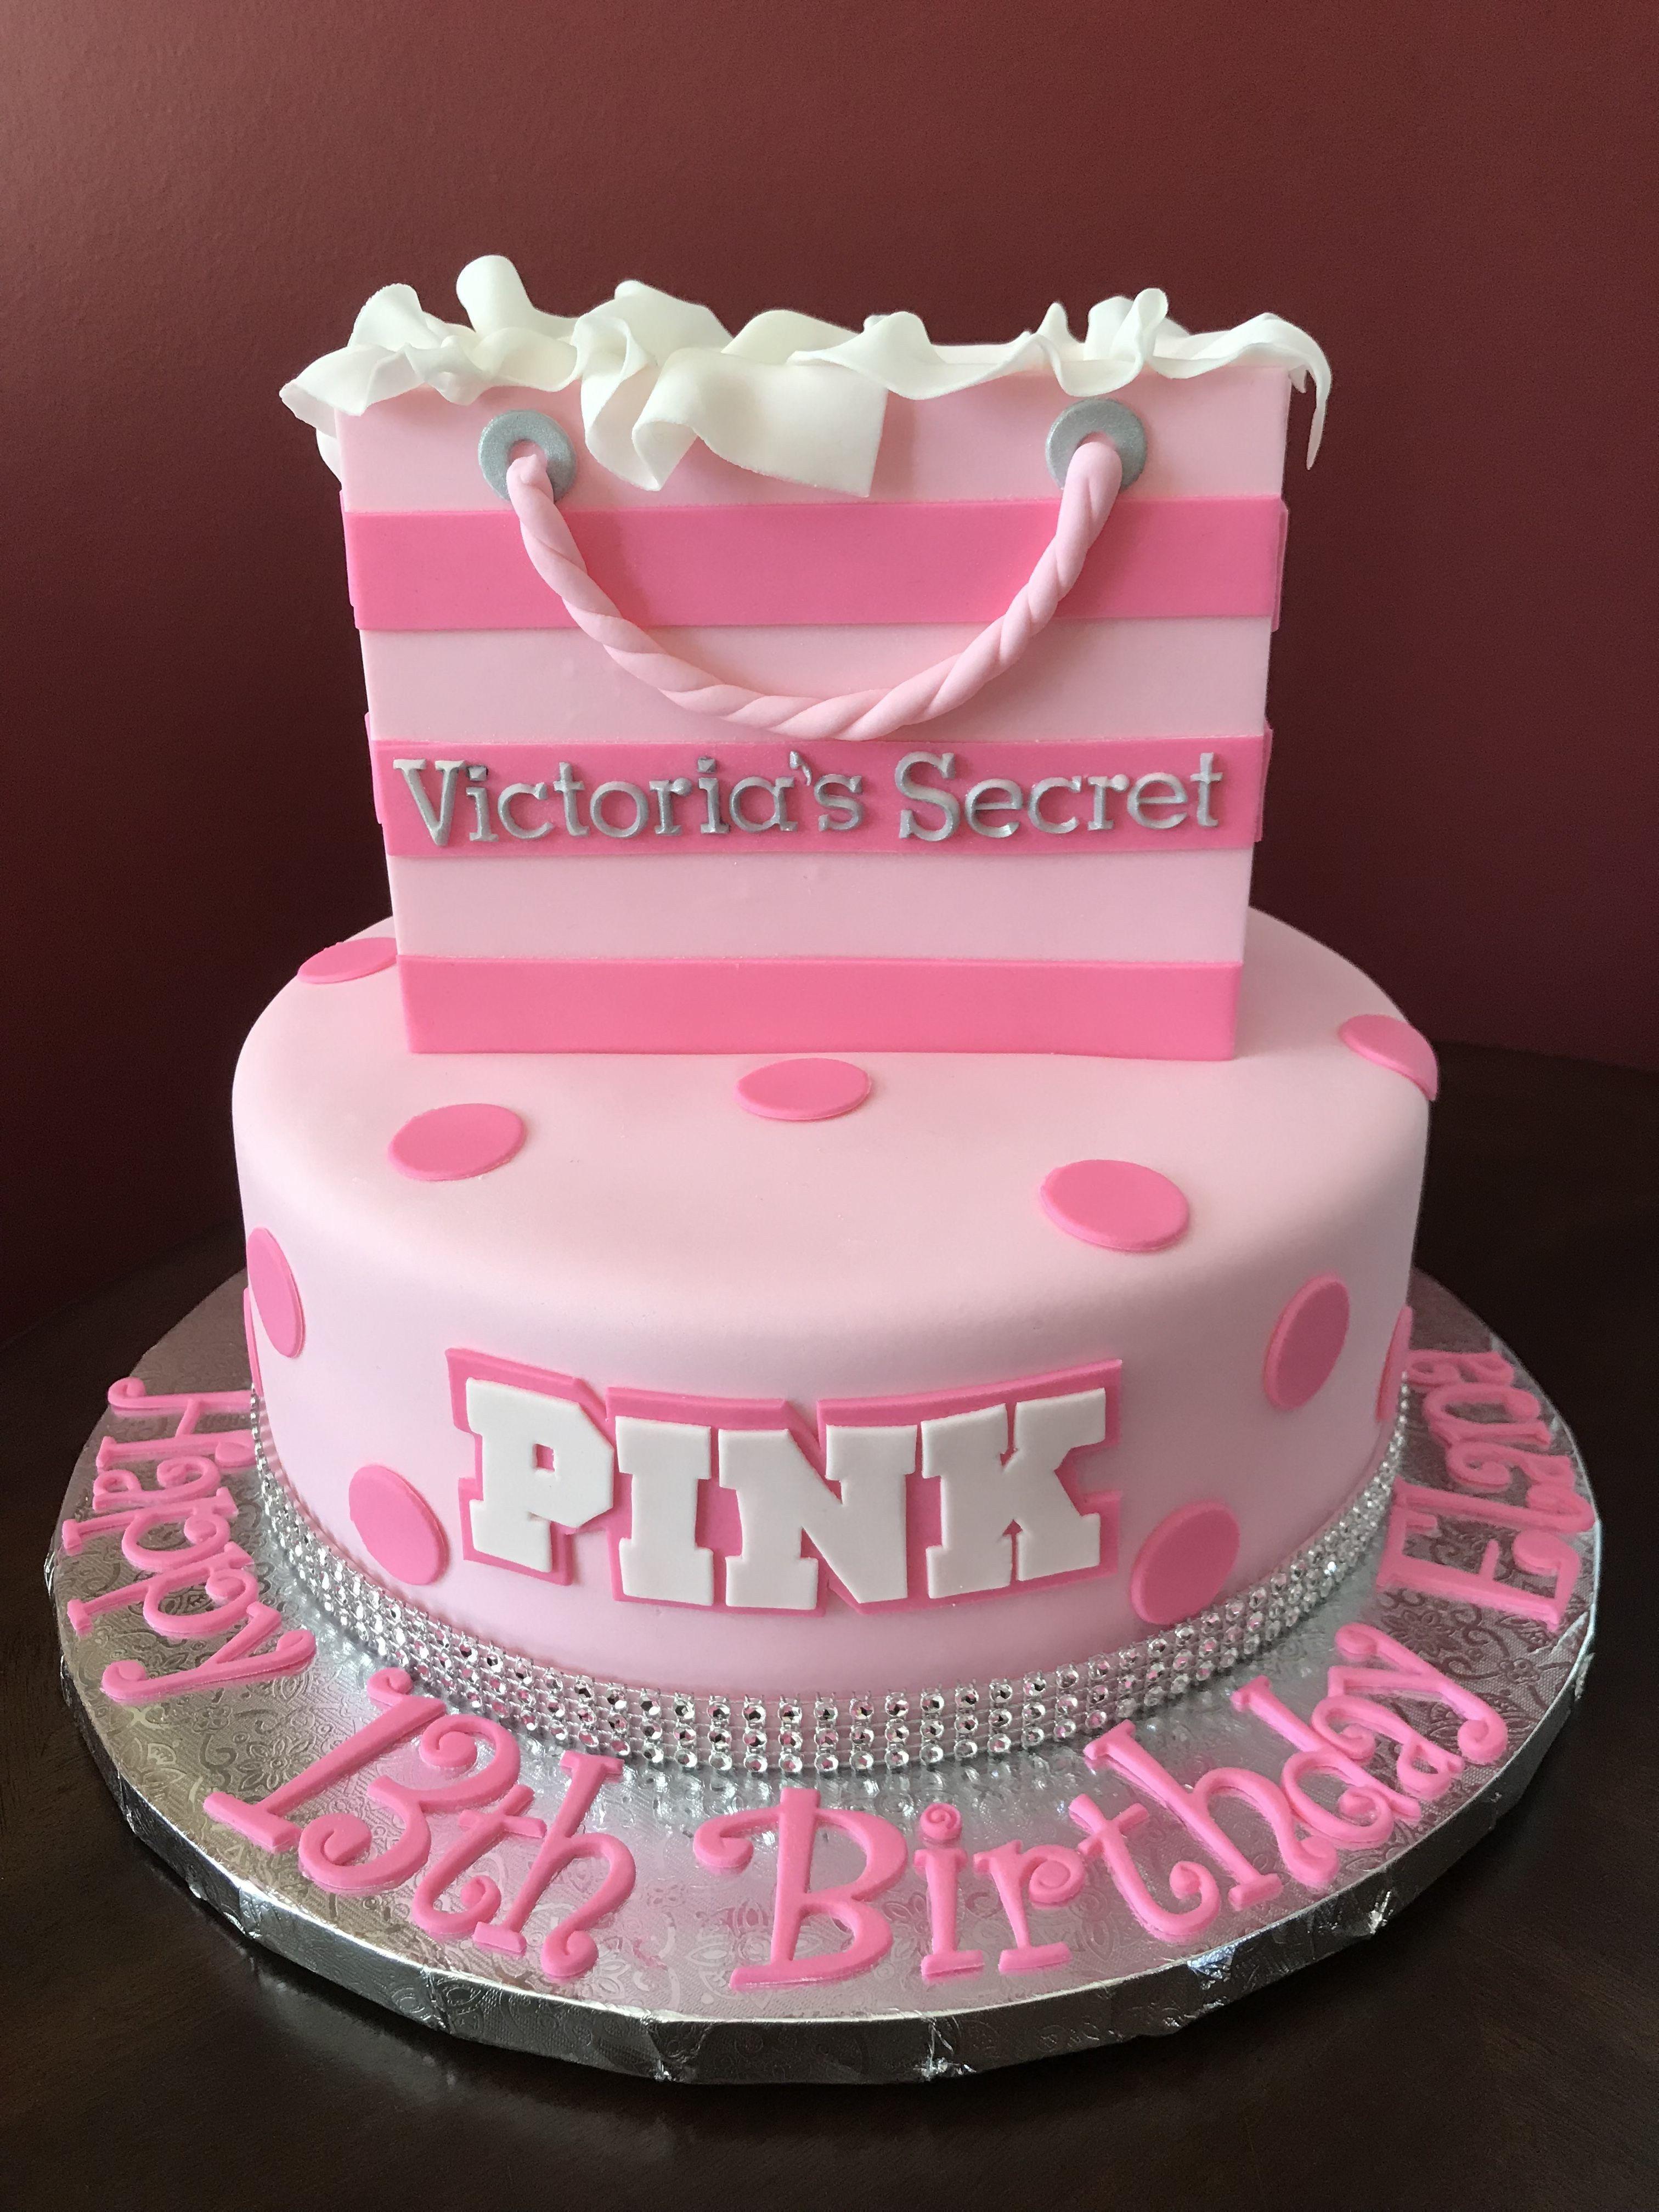 Strange 32 Wonderful Image Of Pink Birthday Cake With Images Pink Personalised Birthday Cards Beptaeletsinfo